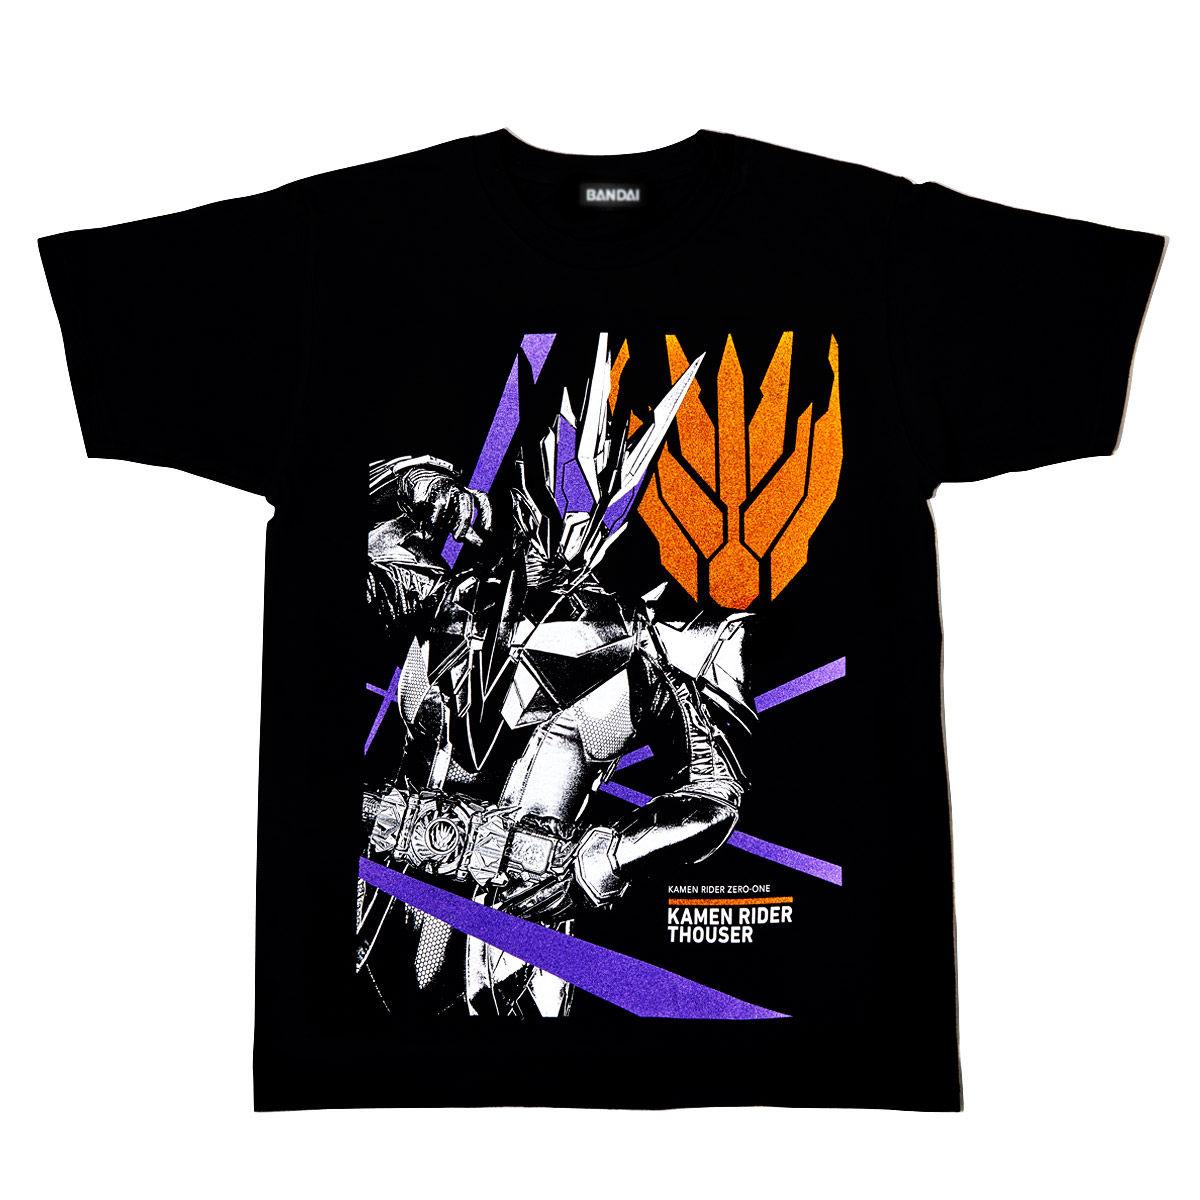 T-shirt of Truth(Kamen Rider Thouser)—Kamen Rider Zero-One